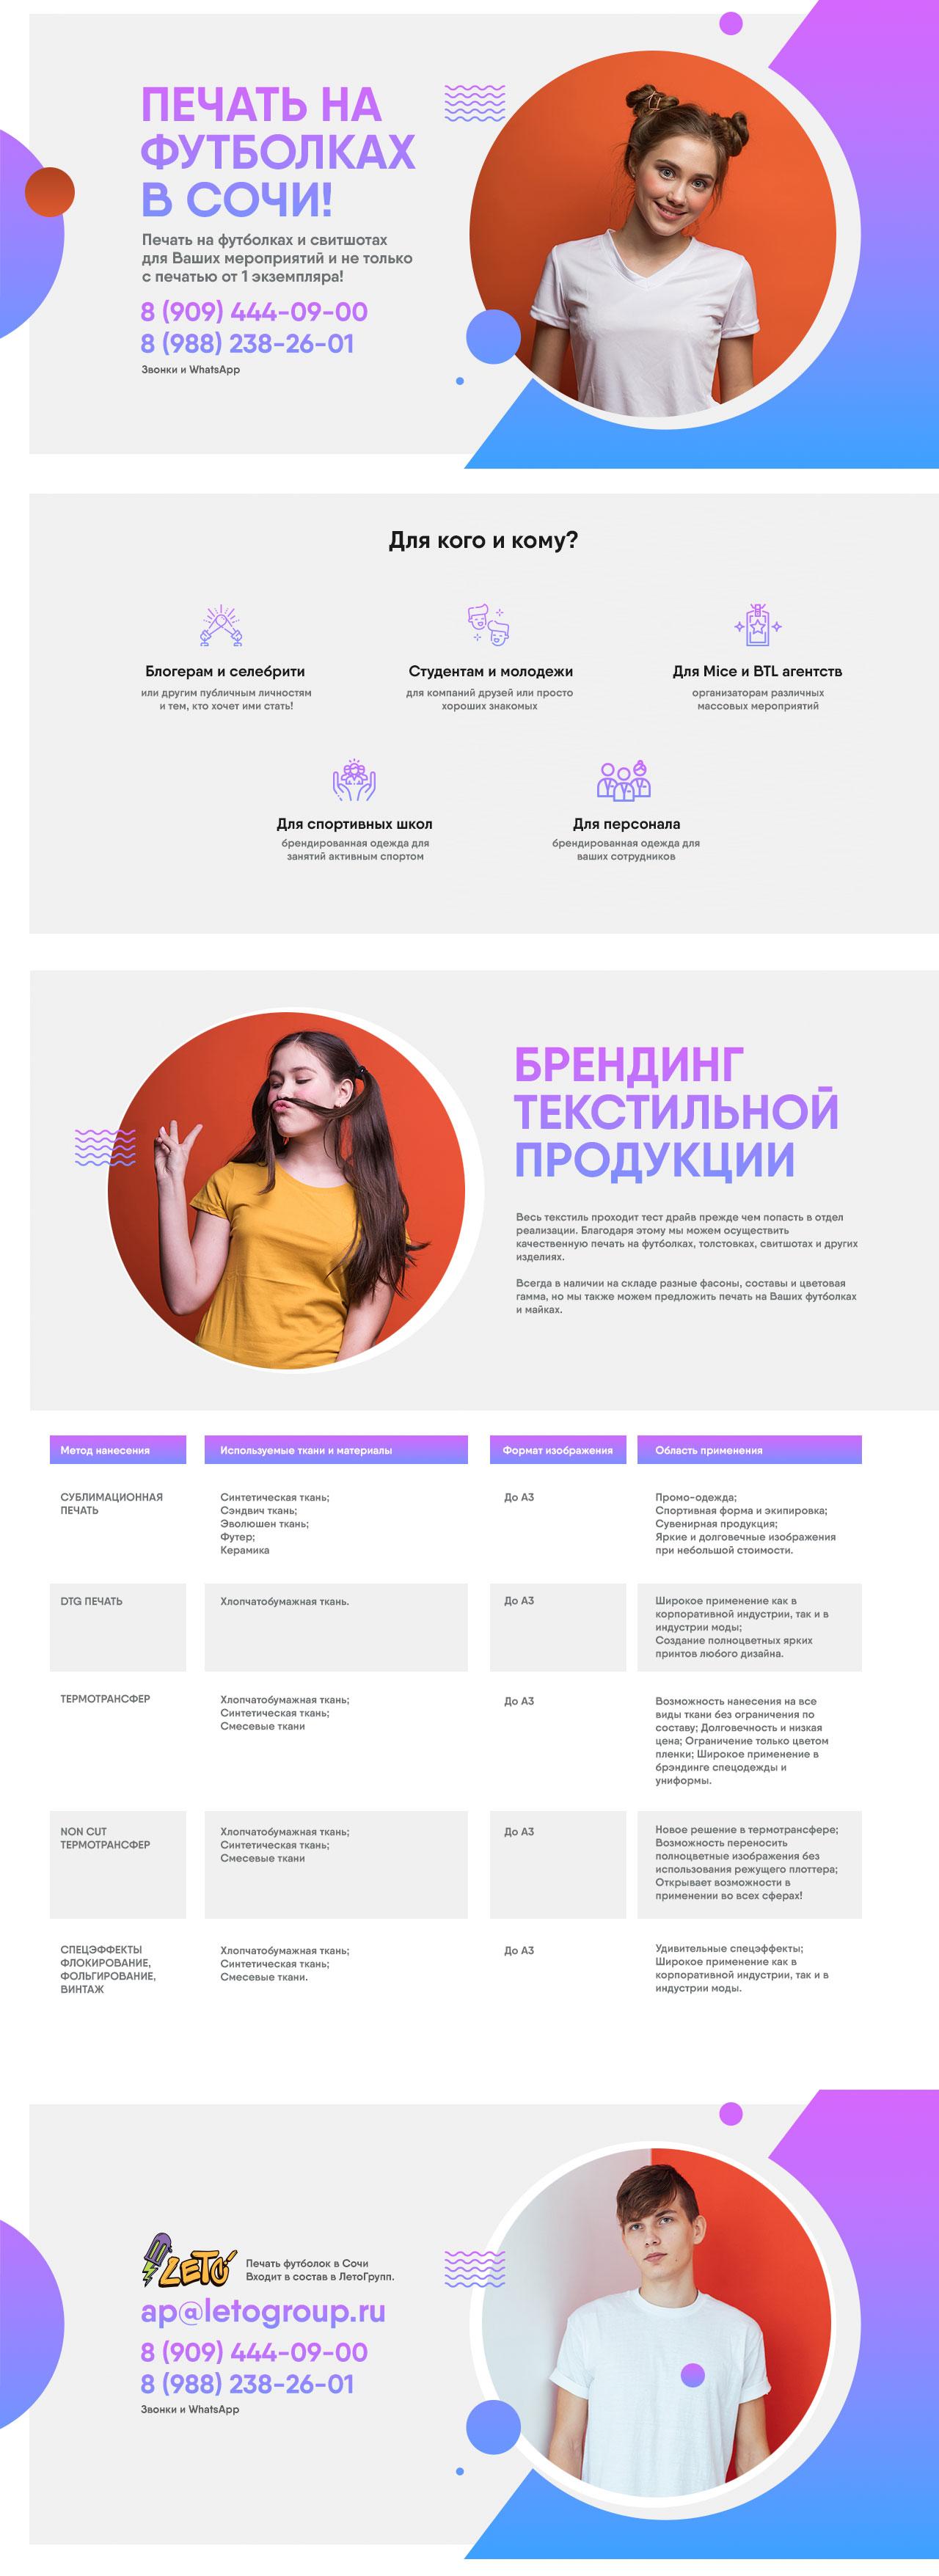 Дизайн сайта печати на майках